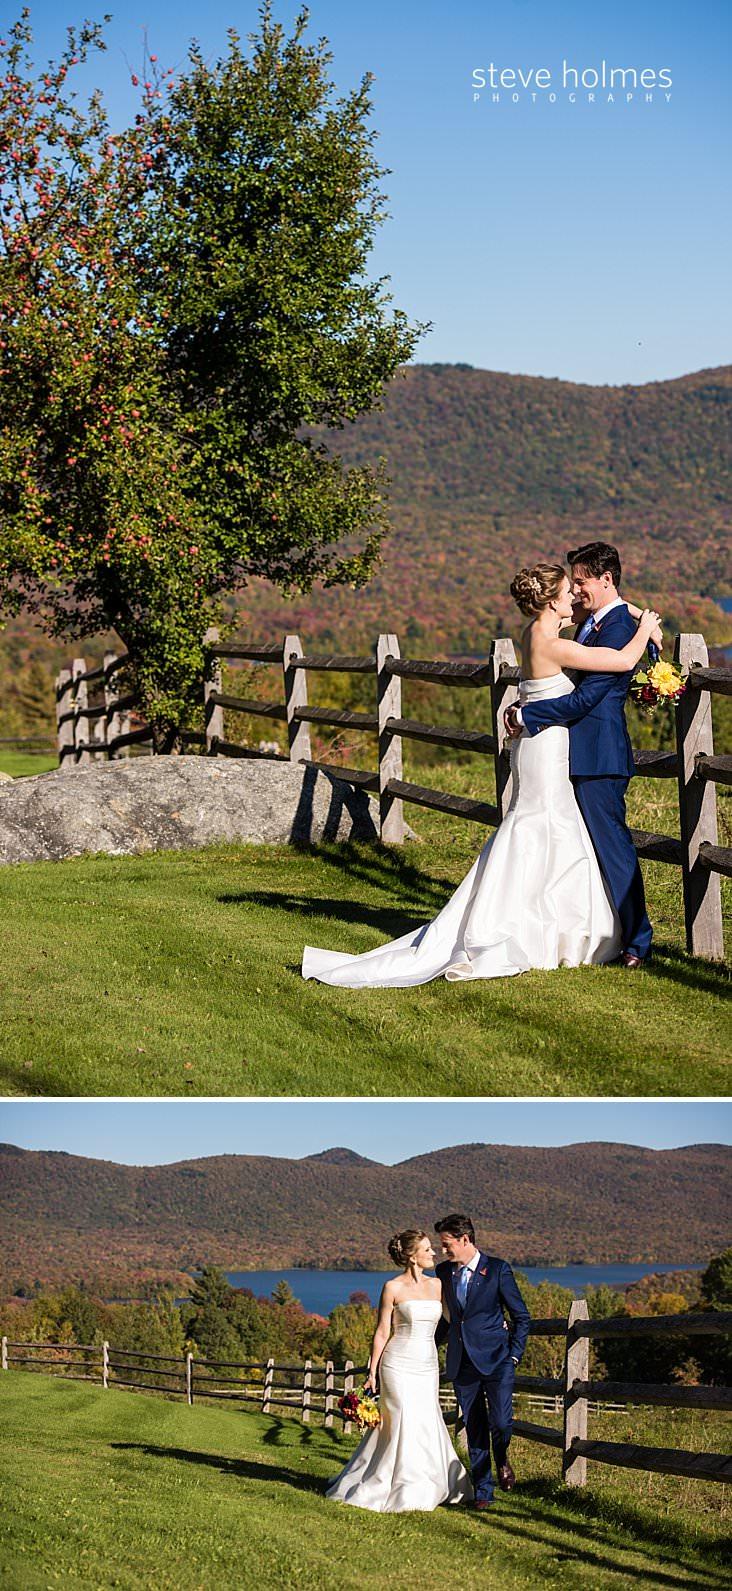 27_Bride and groom hug near fence overlooking autumn mountain landscape.jpg